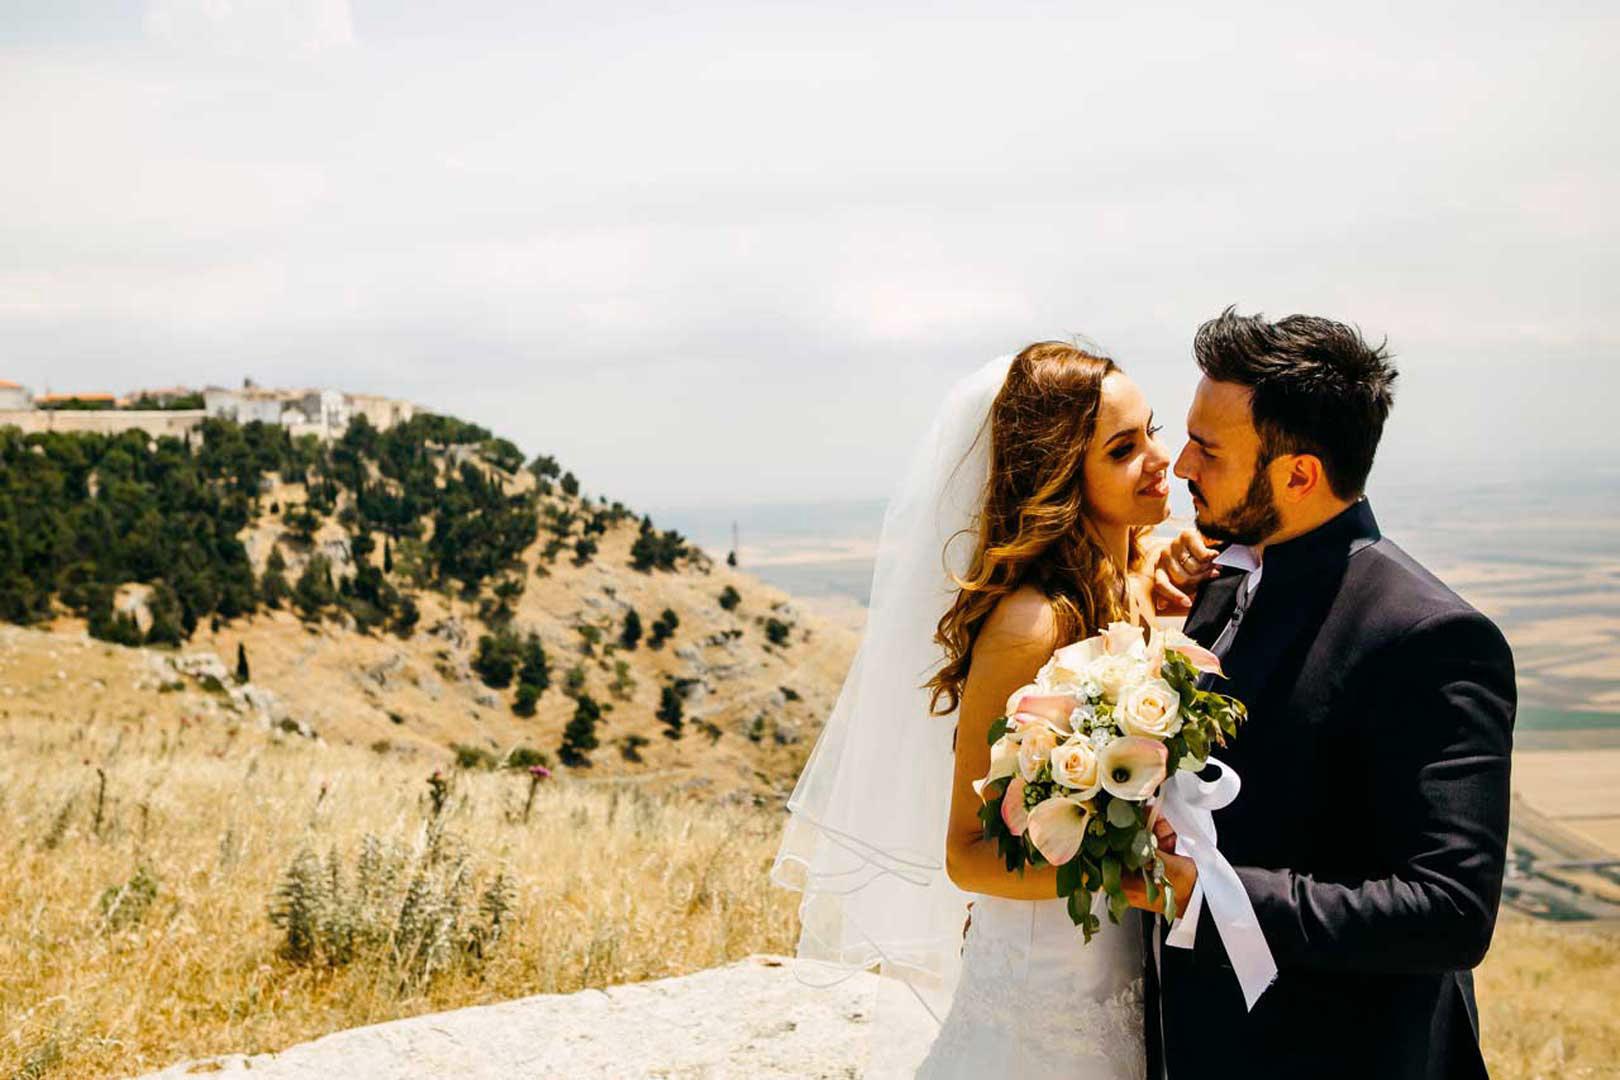 020-rignano-garganico-gianni-lepore-wedding